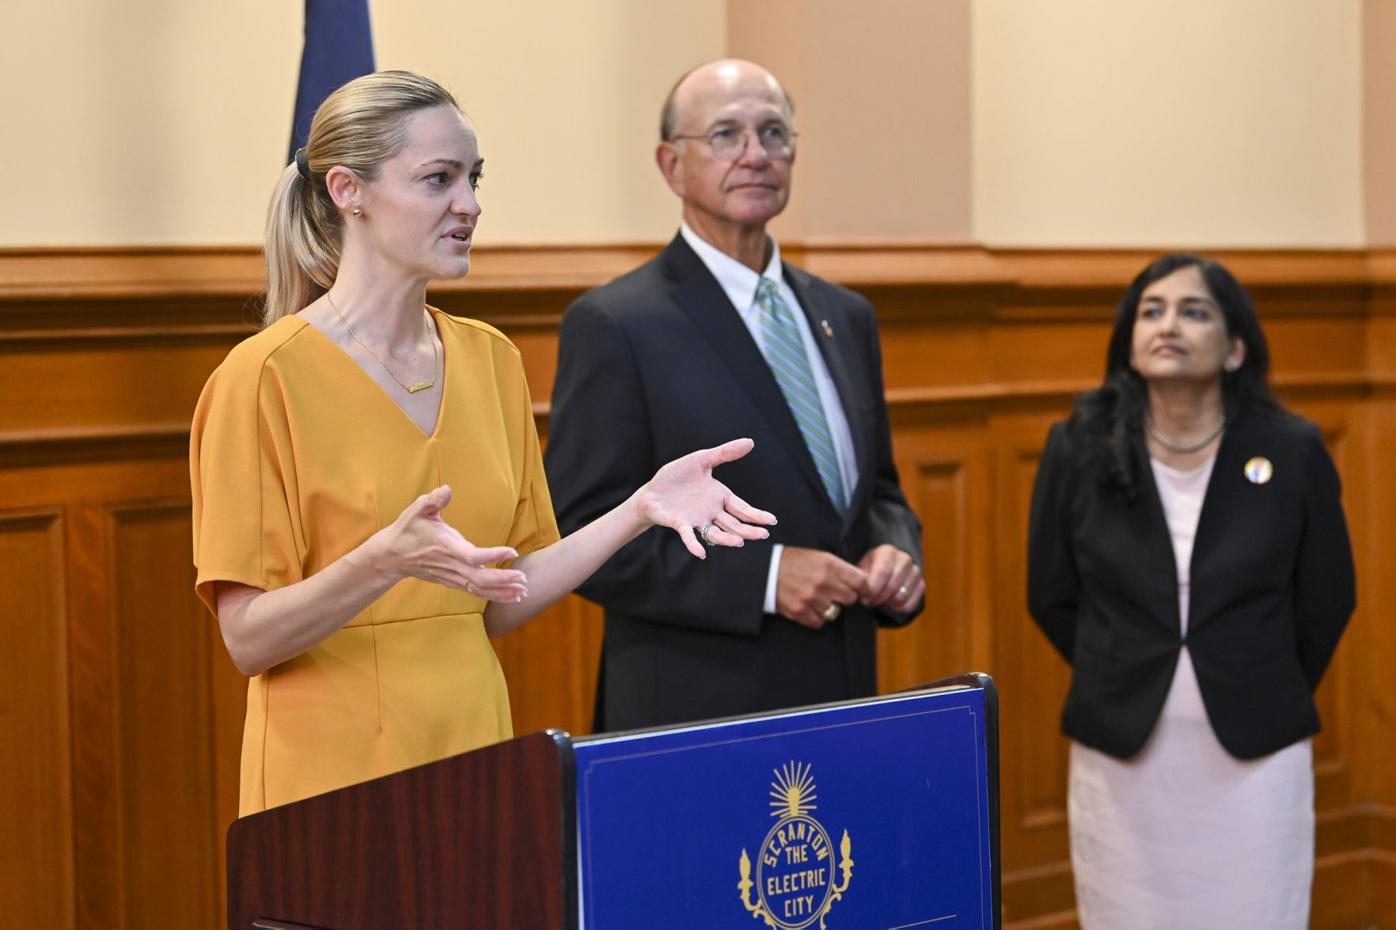 Scranton aims to make new public health coordinator a permanent post